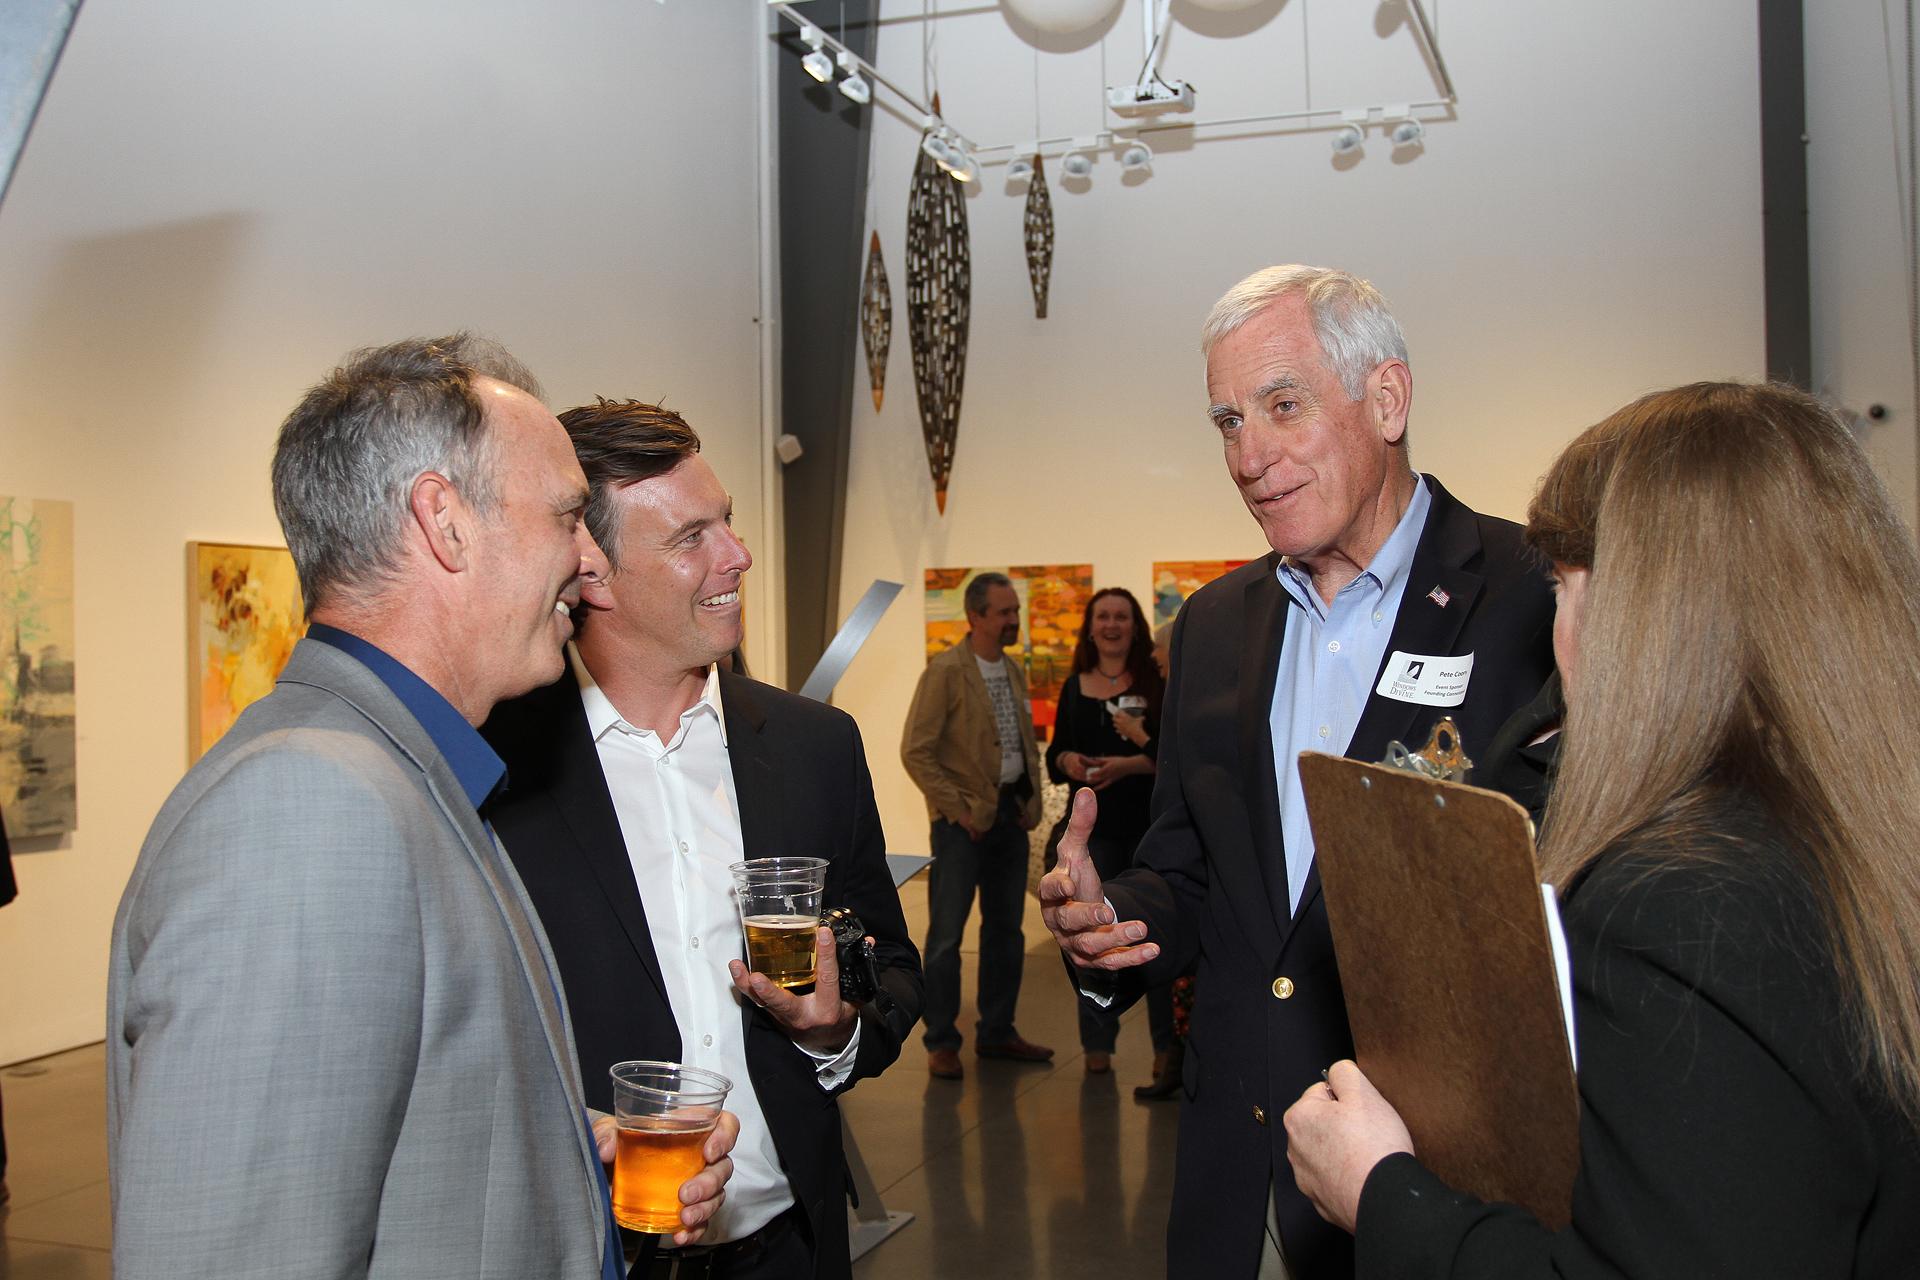 30 – IMG_5060_Opening Gala_Windows Artists John McCaw, Danny McCaw, Pete Coors & Shannon Robinson